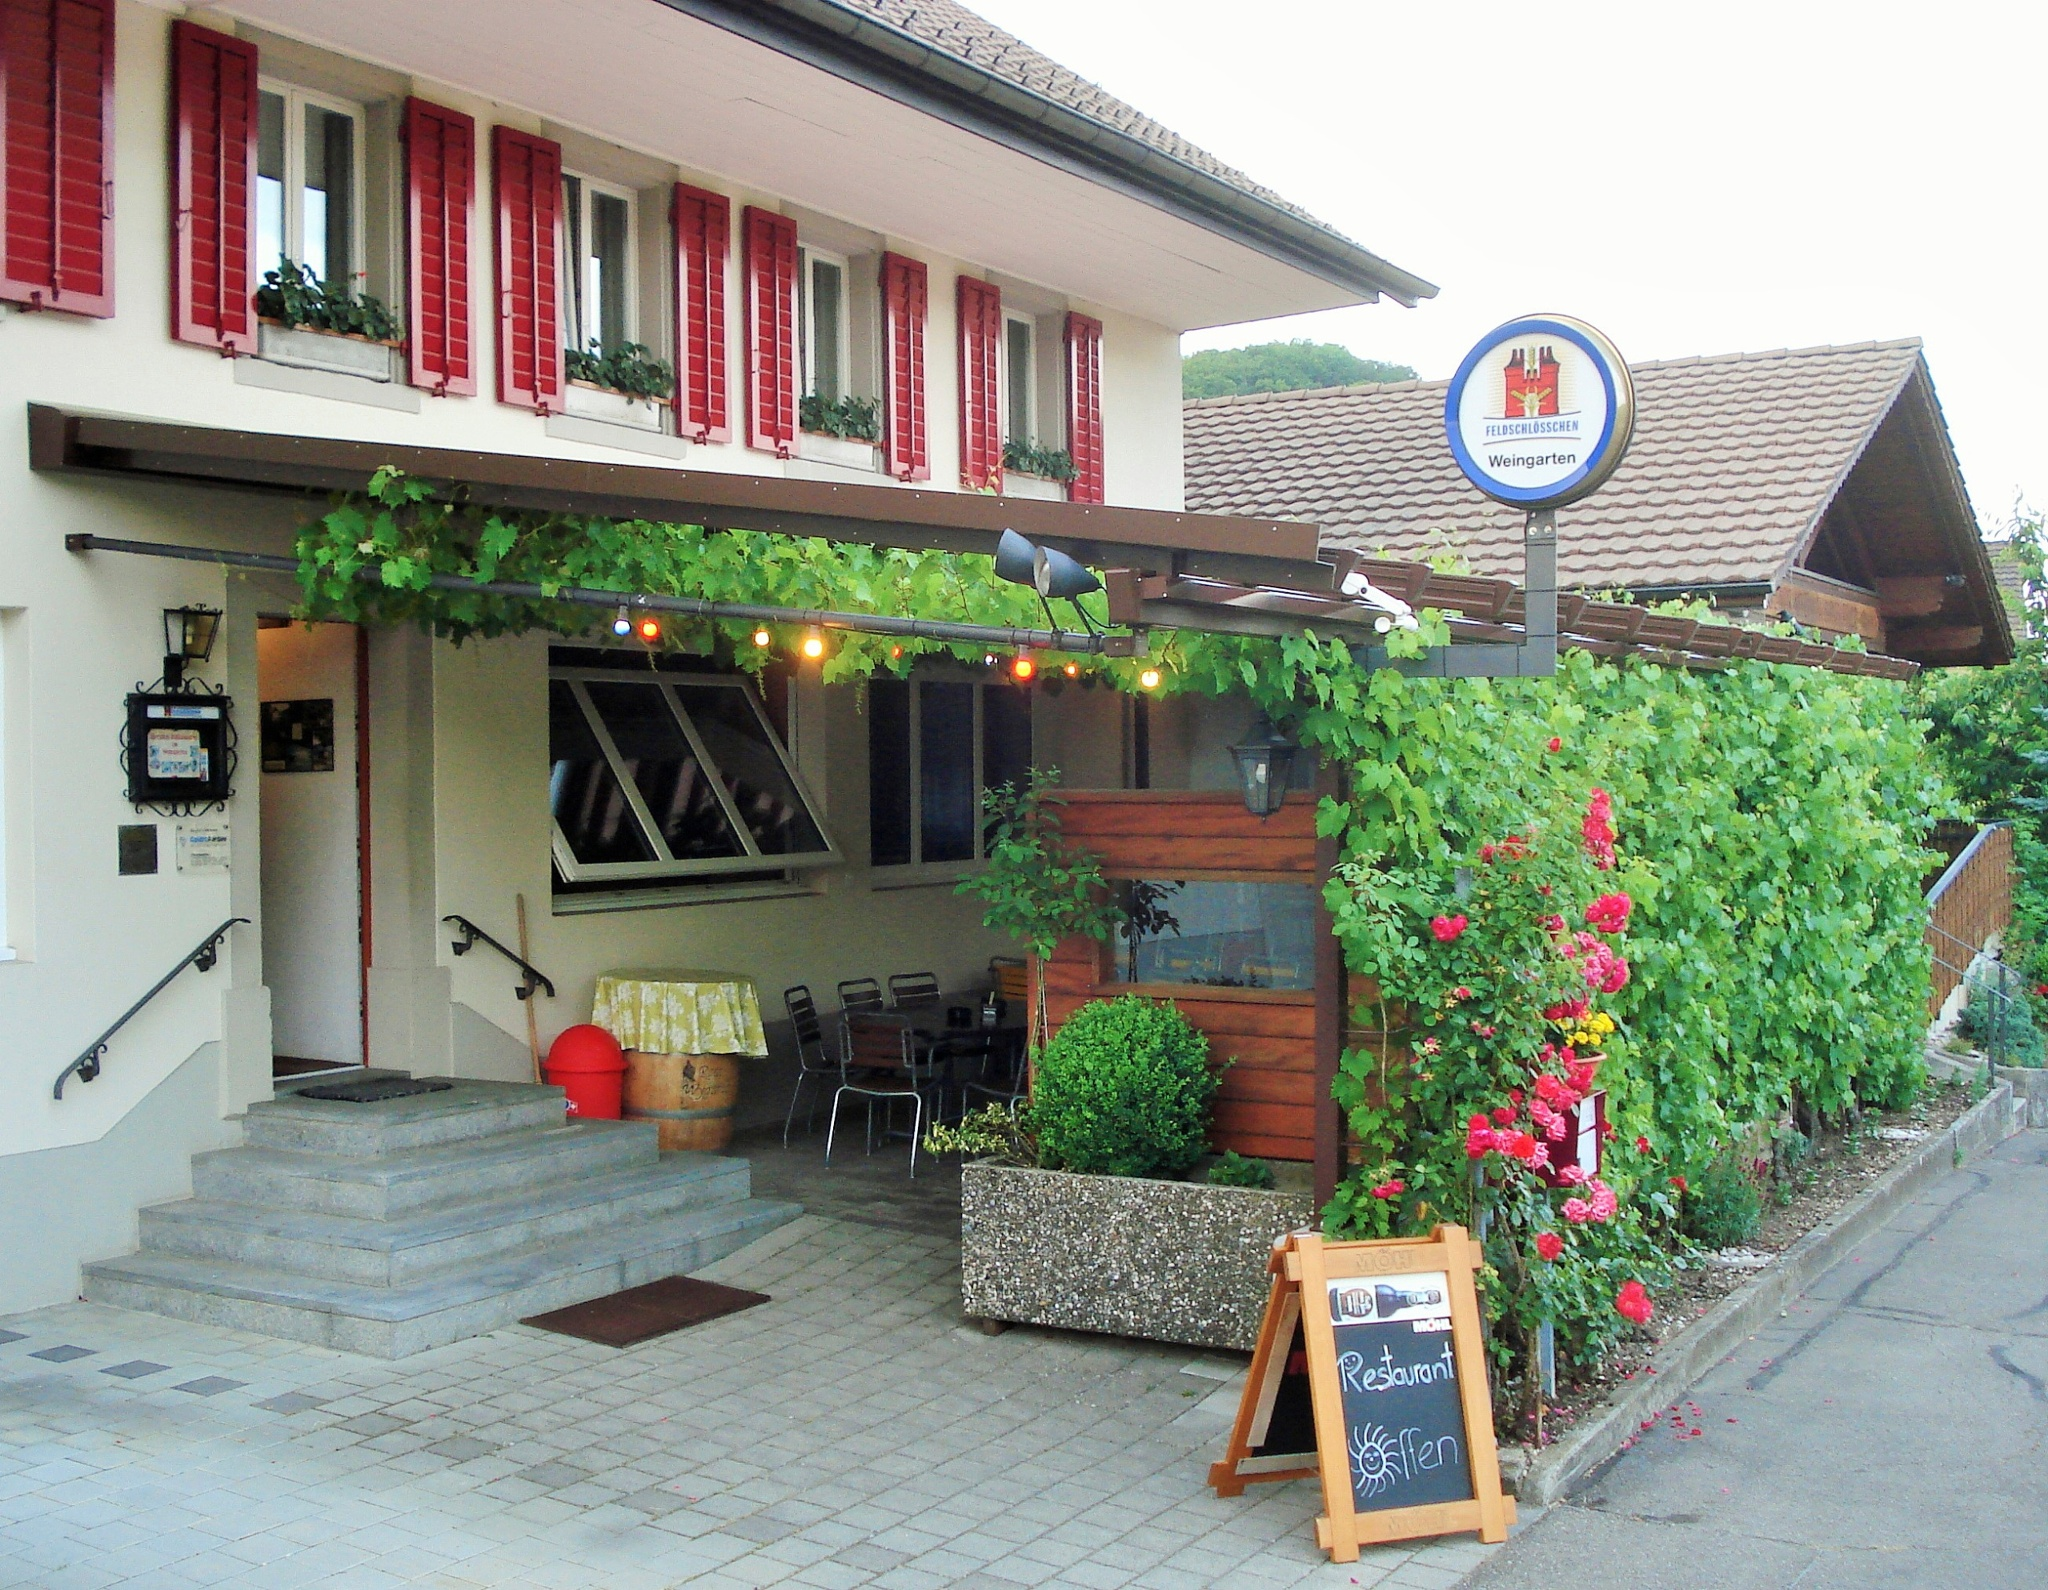 Cafe Weingarten